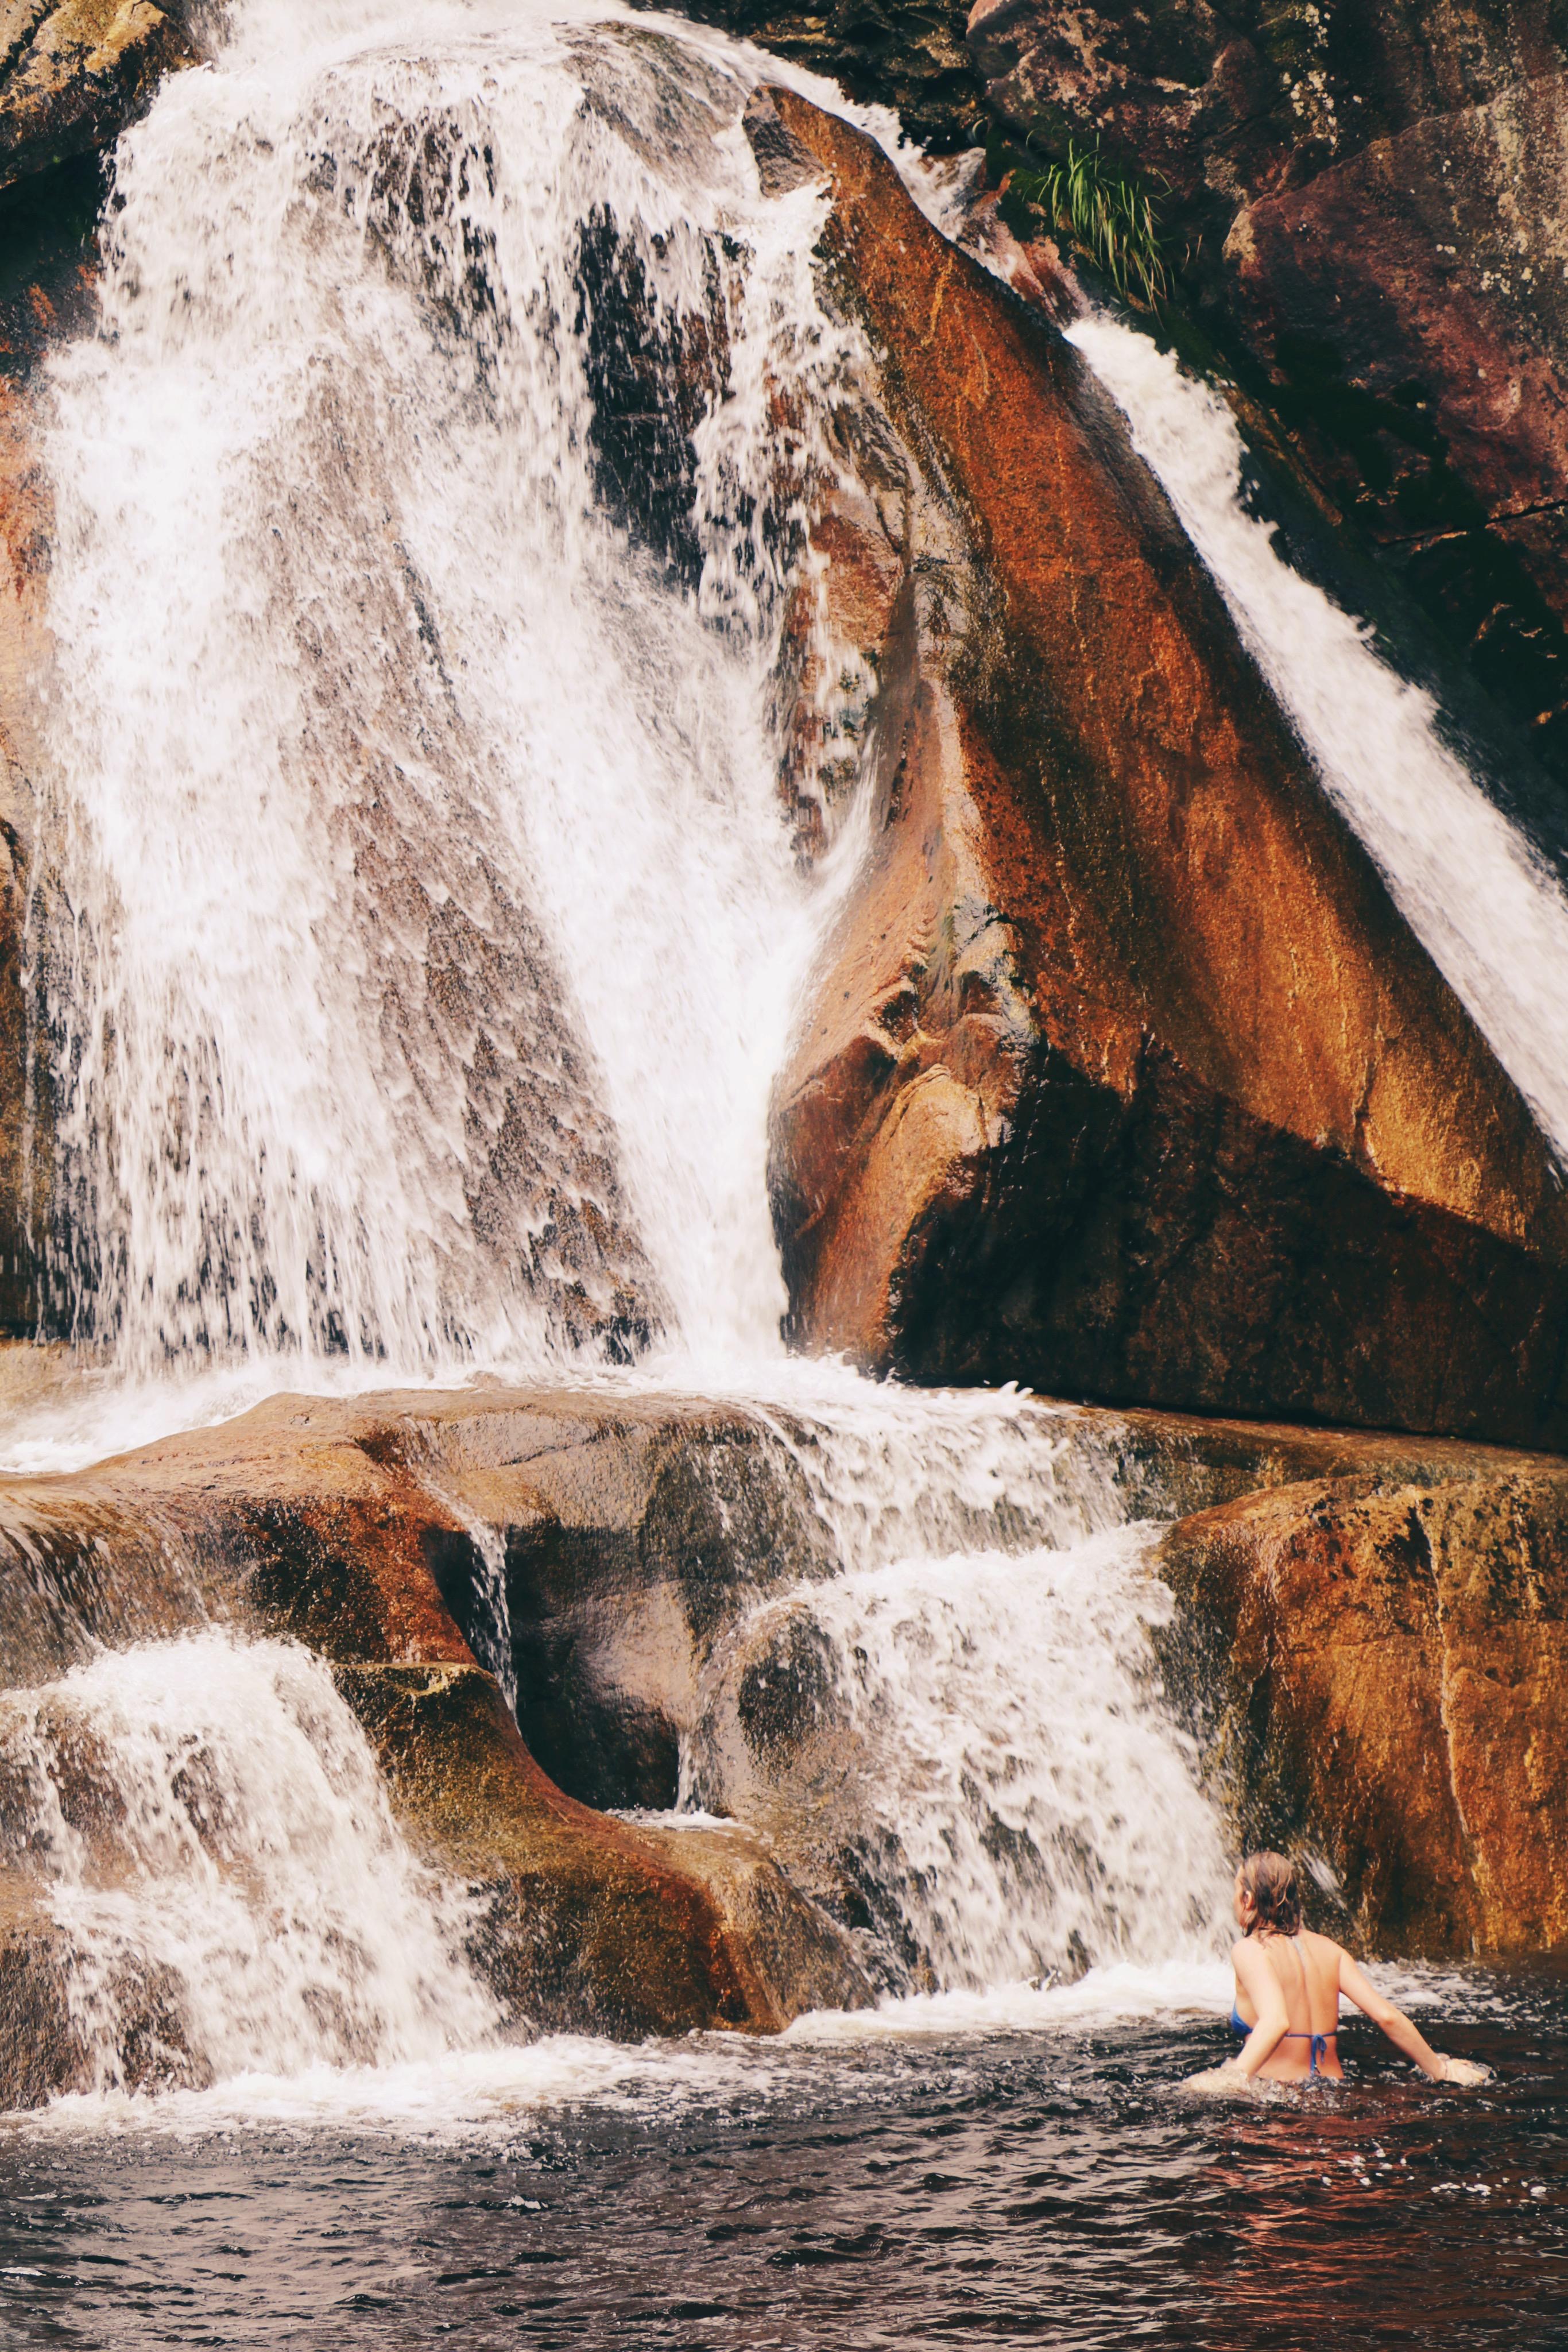 Zuid-Afrika Garden Route Tips - Watervallen Wilderness